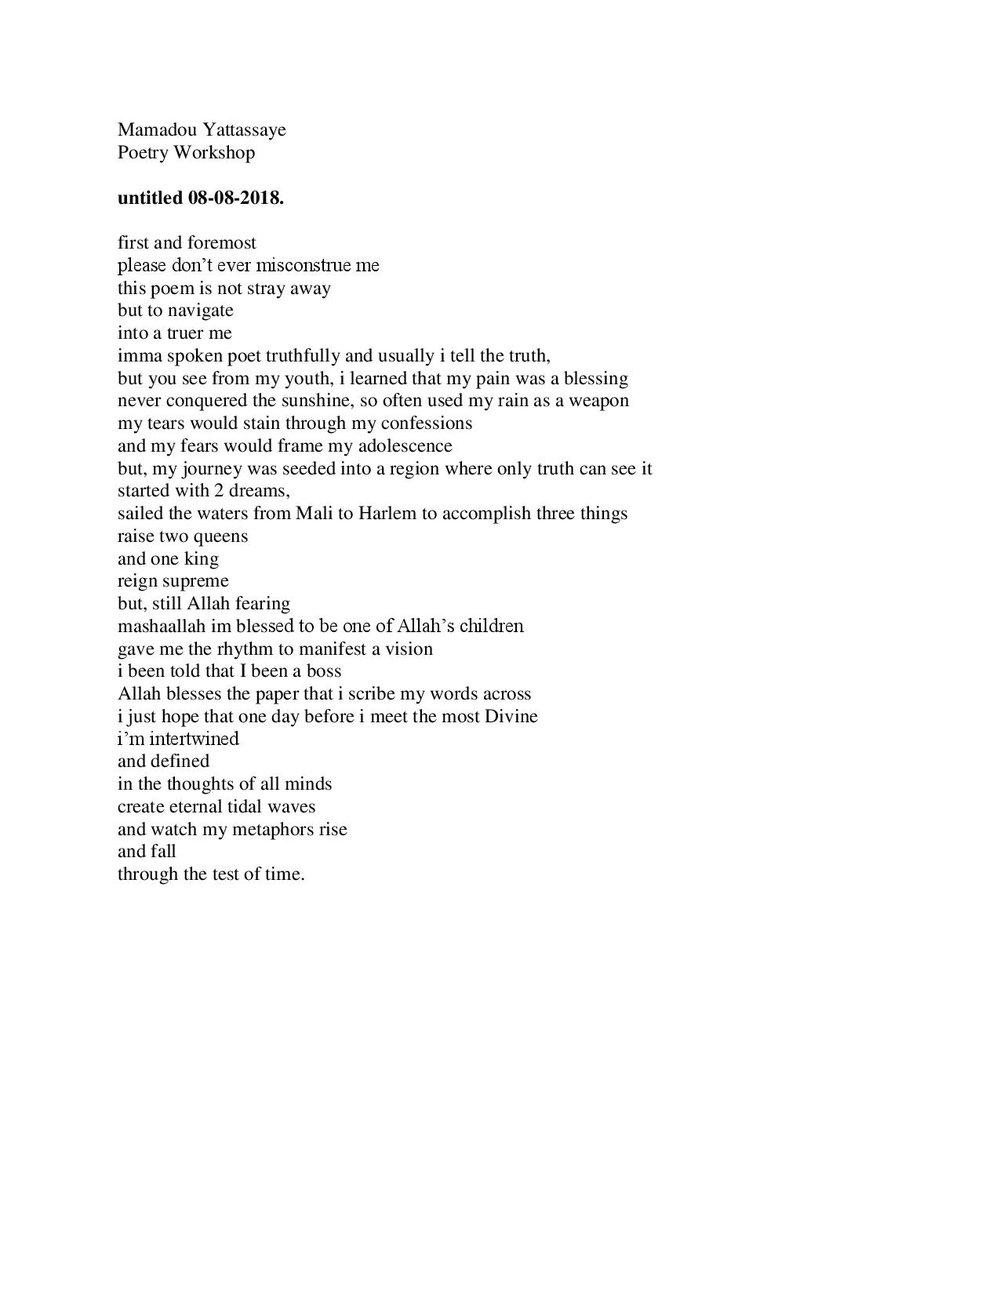 untitled 08-08-2018.-page-001.jpg